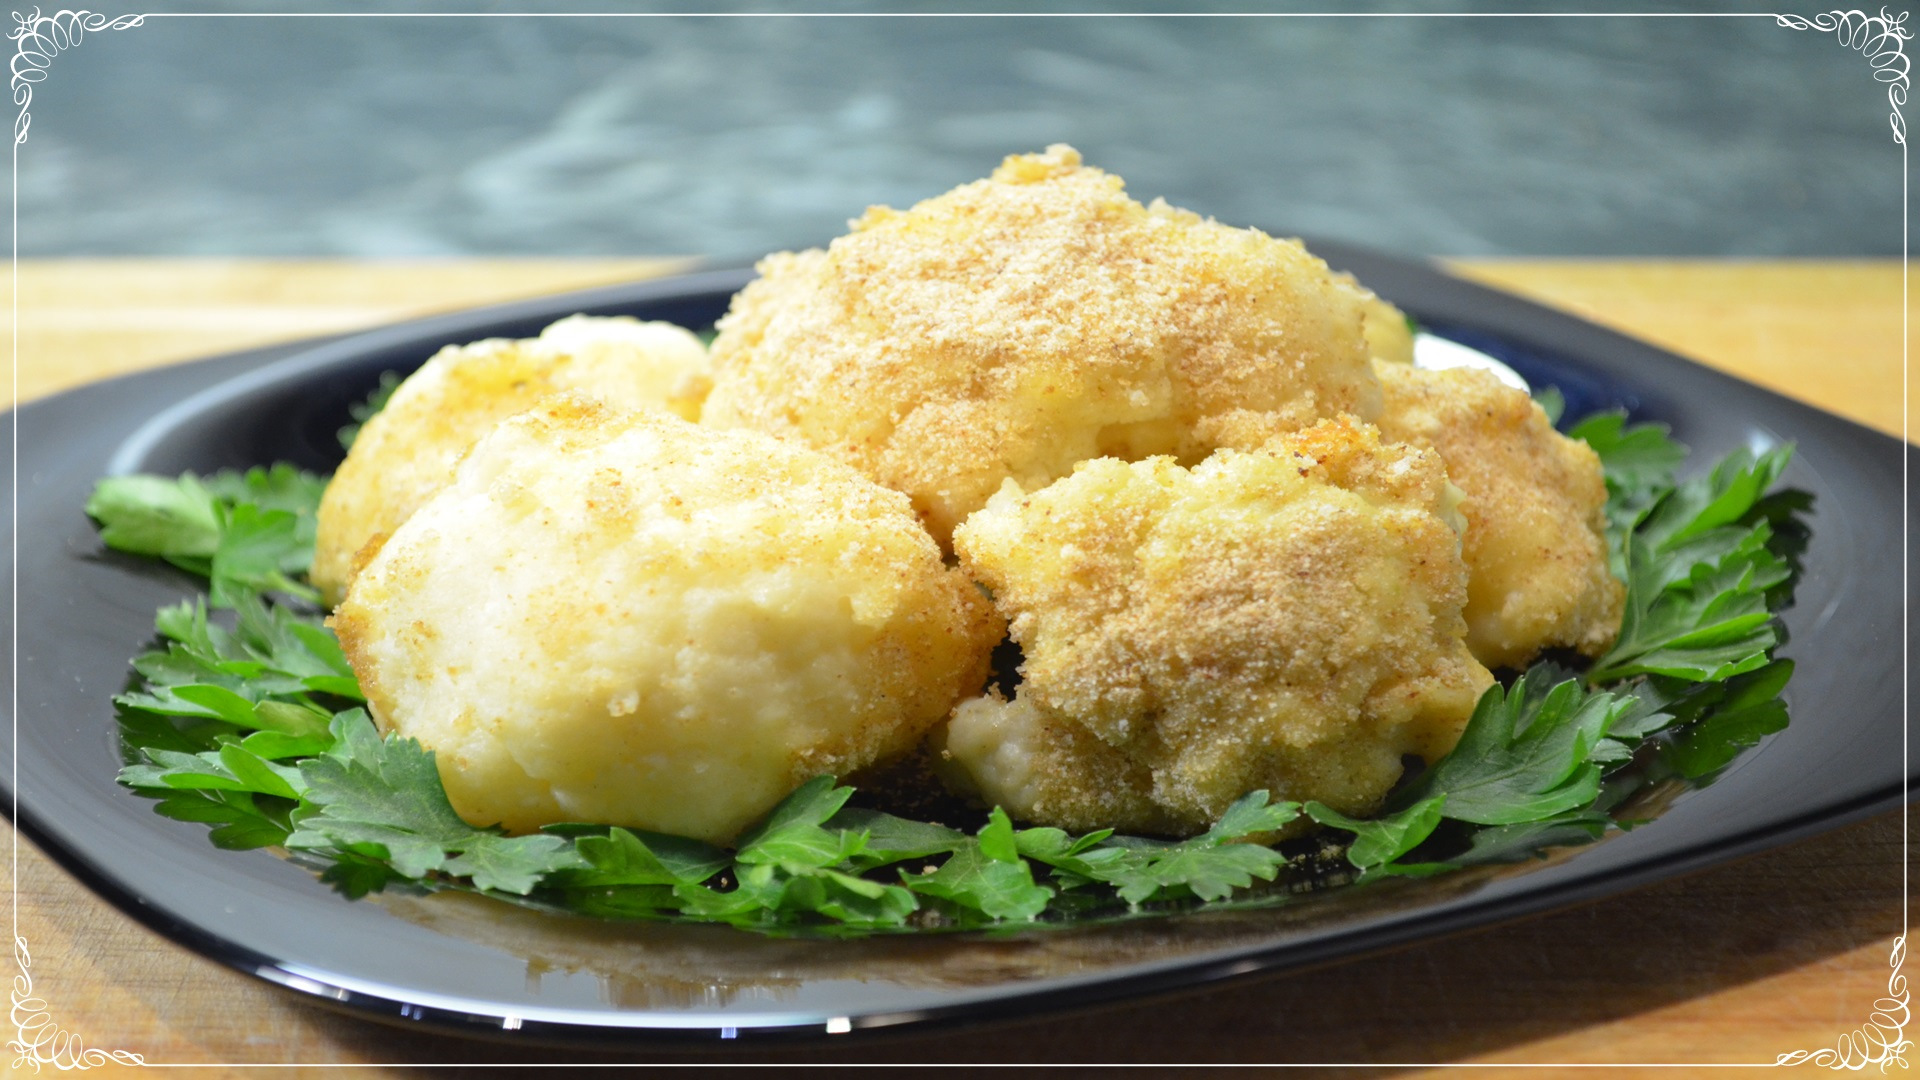 Цветная капуста запеченная с сыром рецепт пошаговый